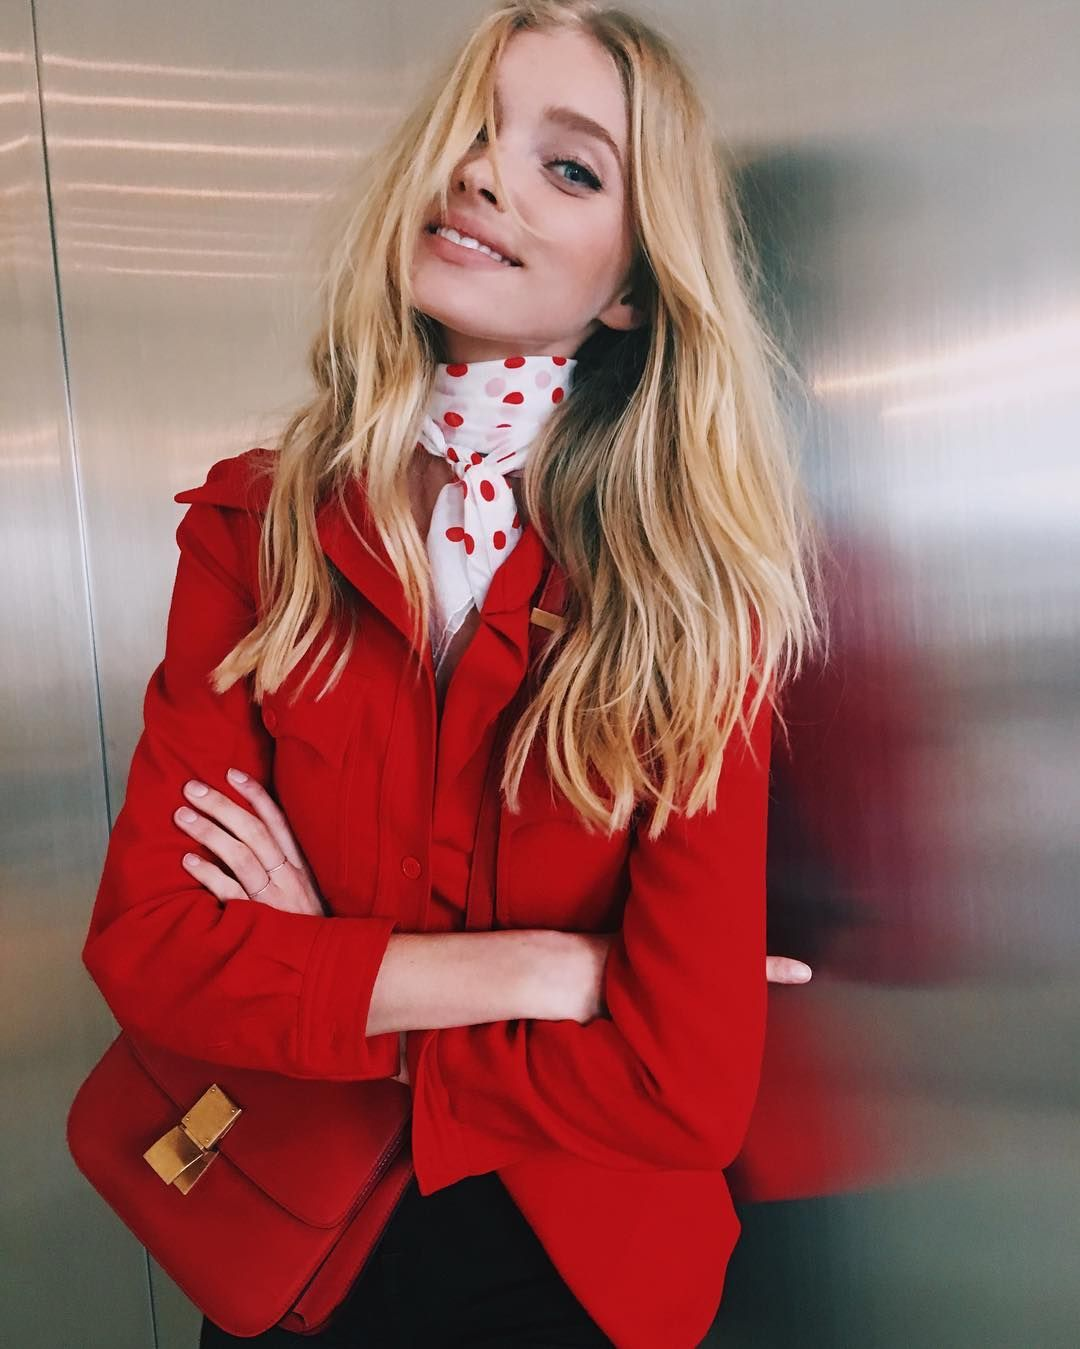 Snapchat Elsa Anna Hosk nude photos 2019